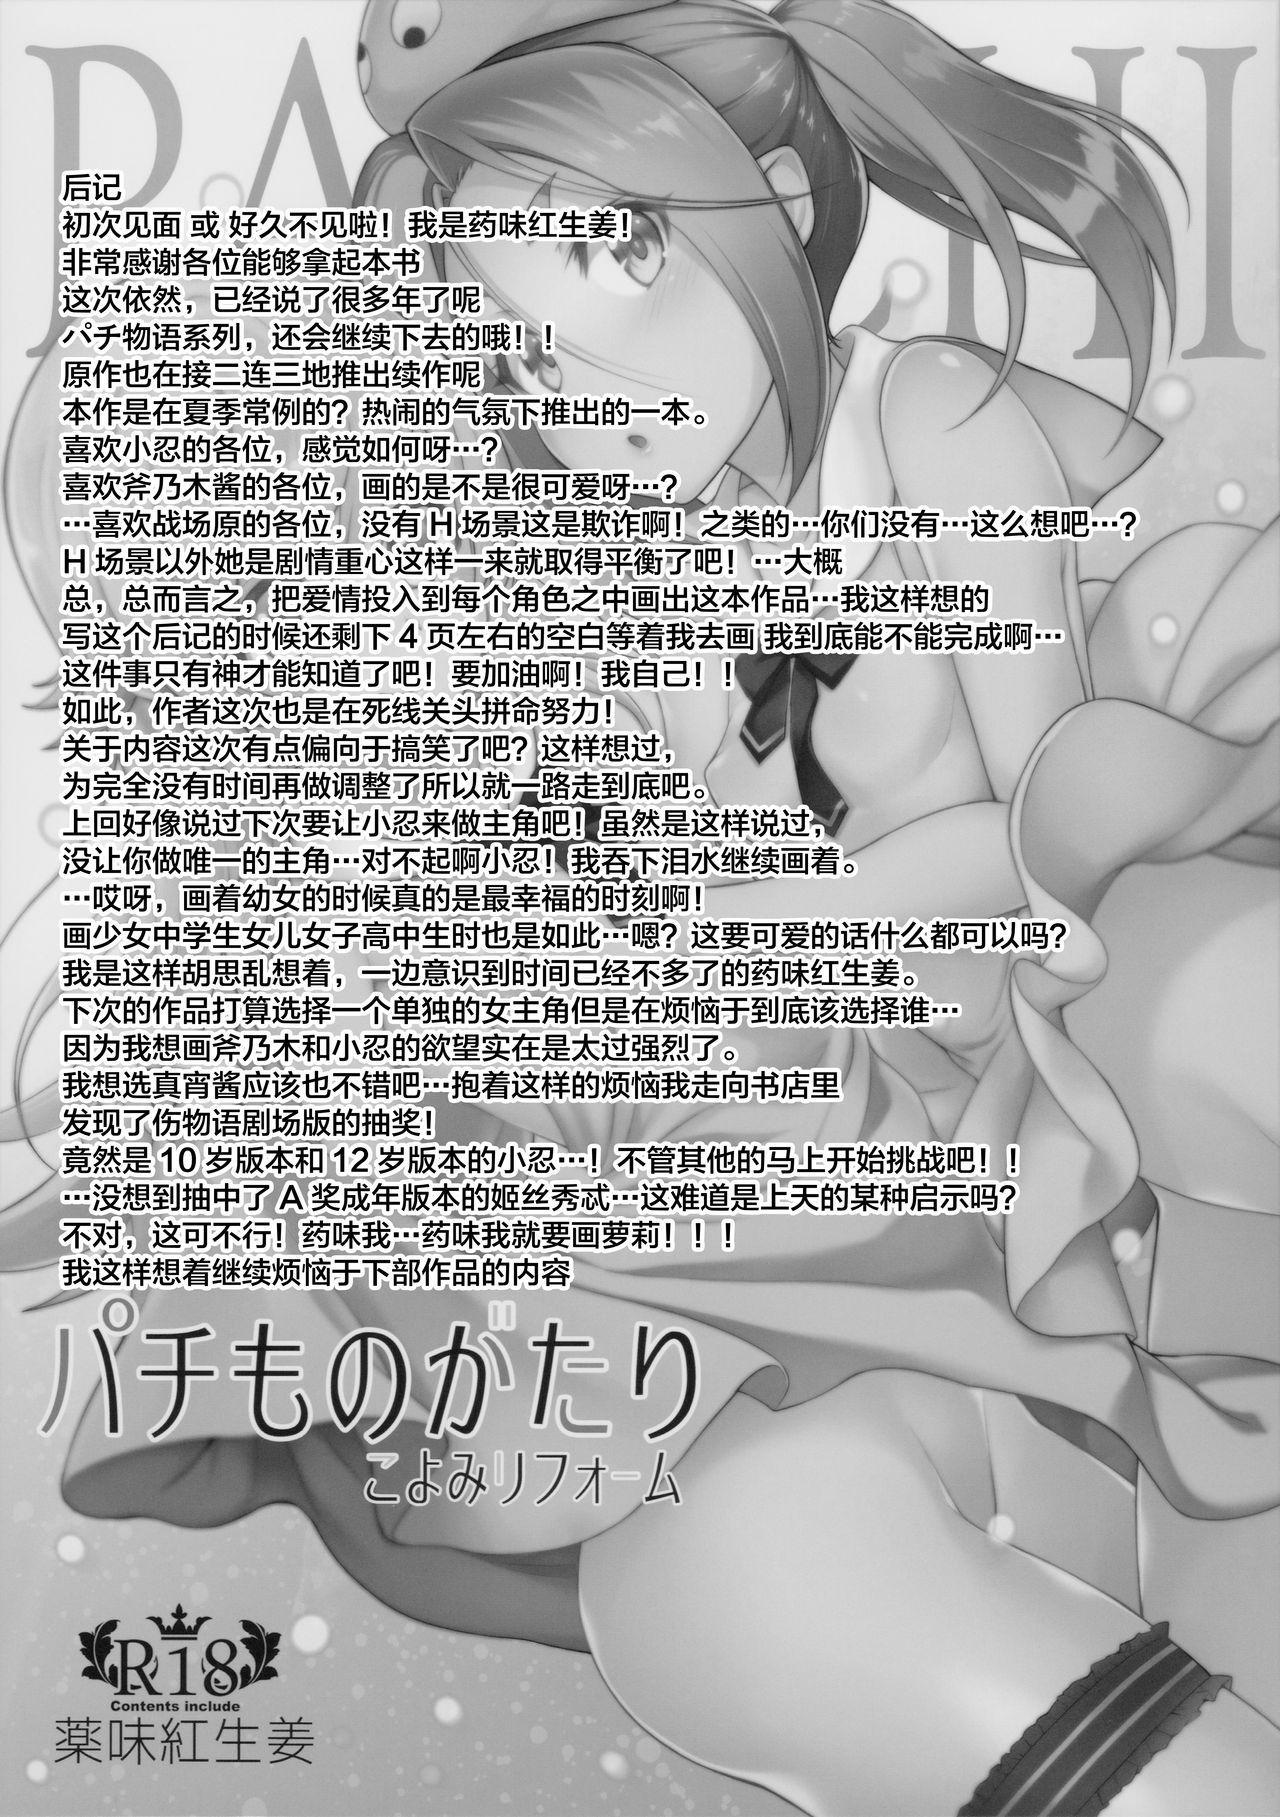 Pachimonogatari Part 12: Koyomi Reform 26